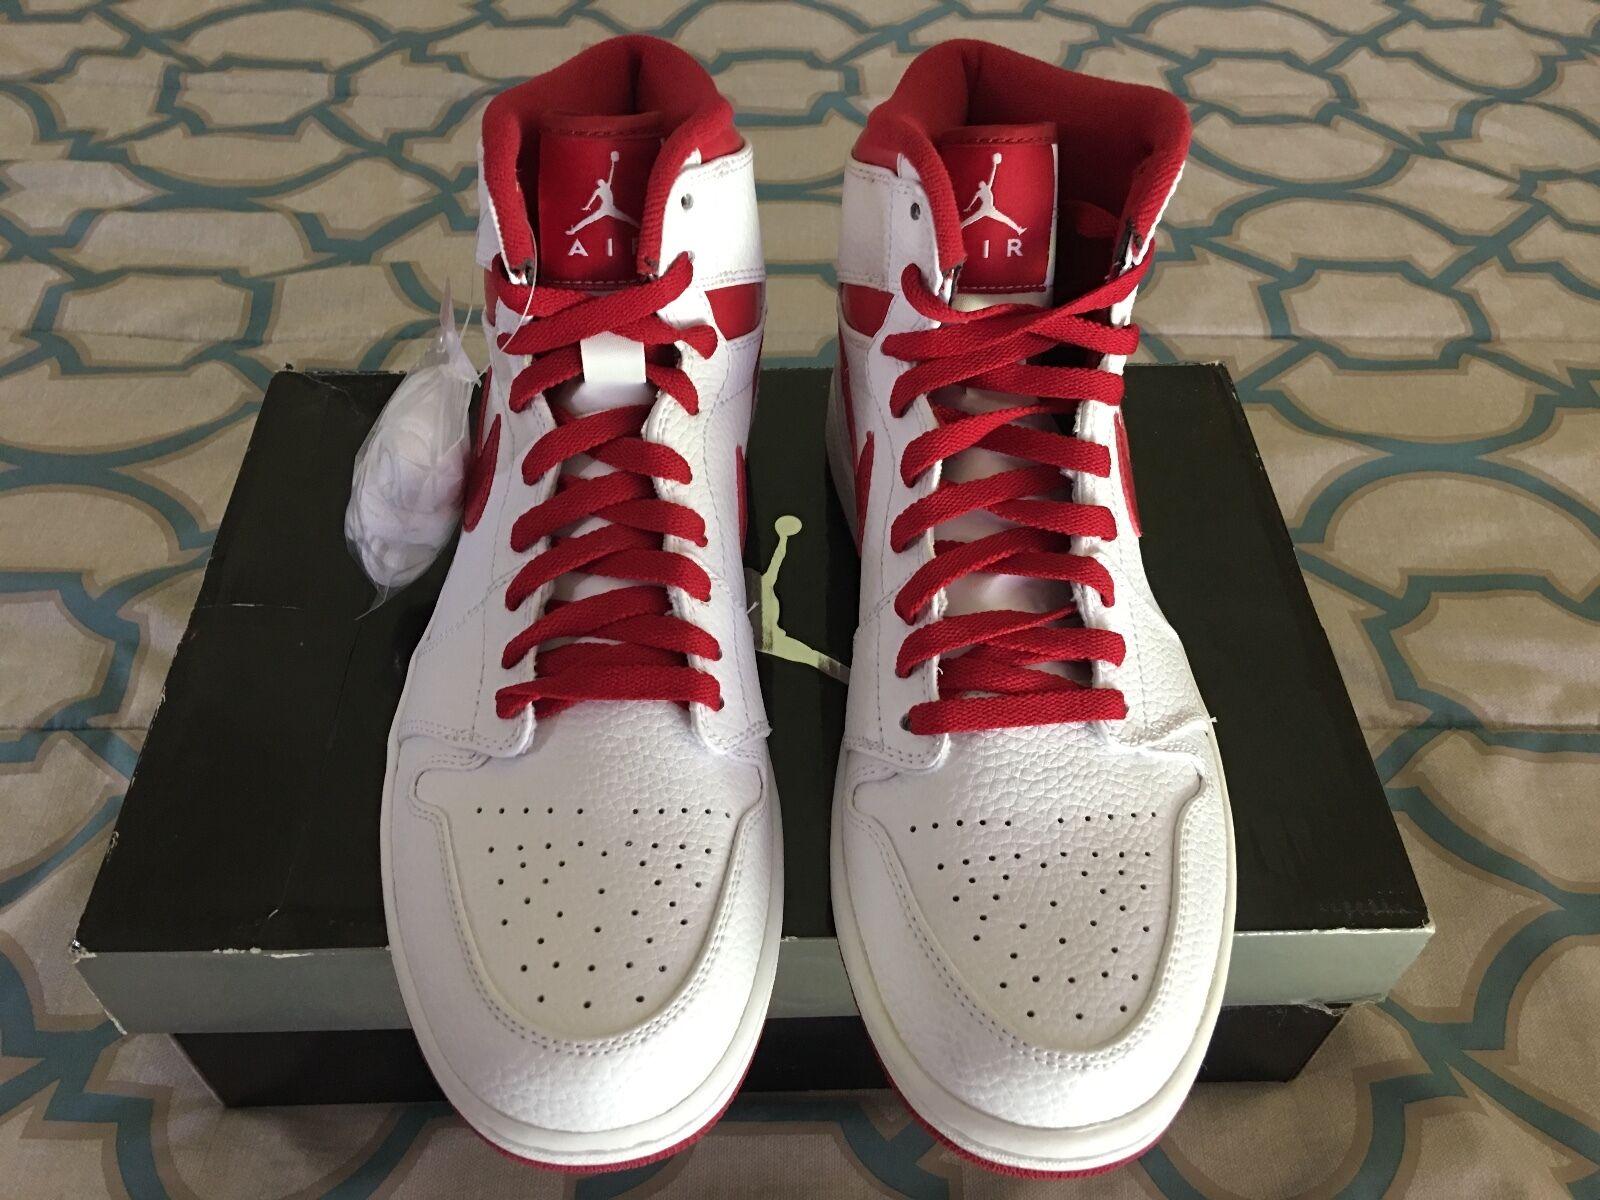 Air Jordan 1 retro high DTRT do the right thing high red